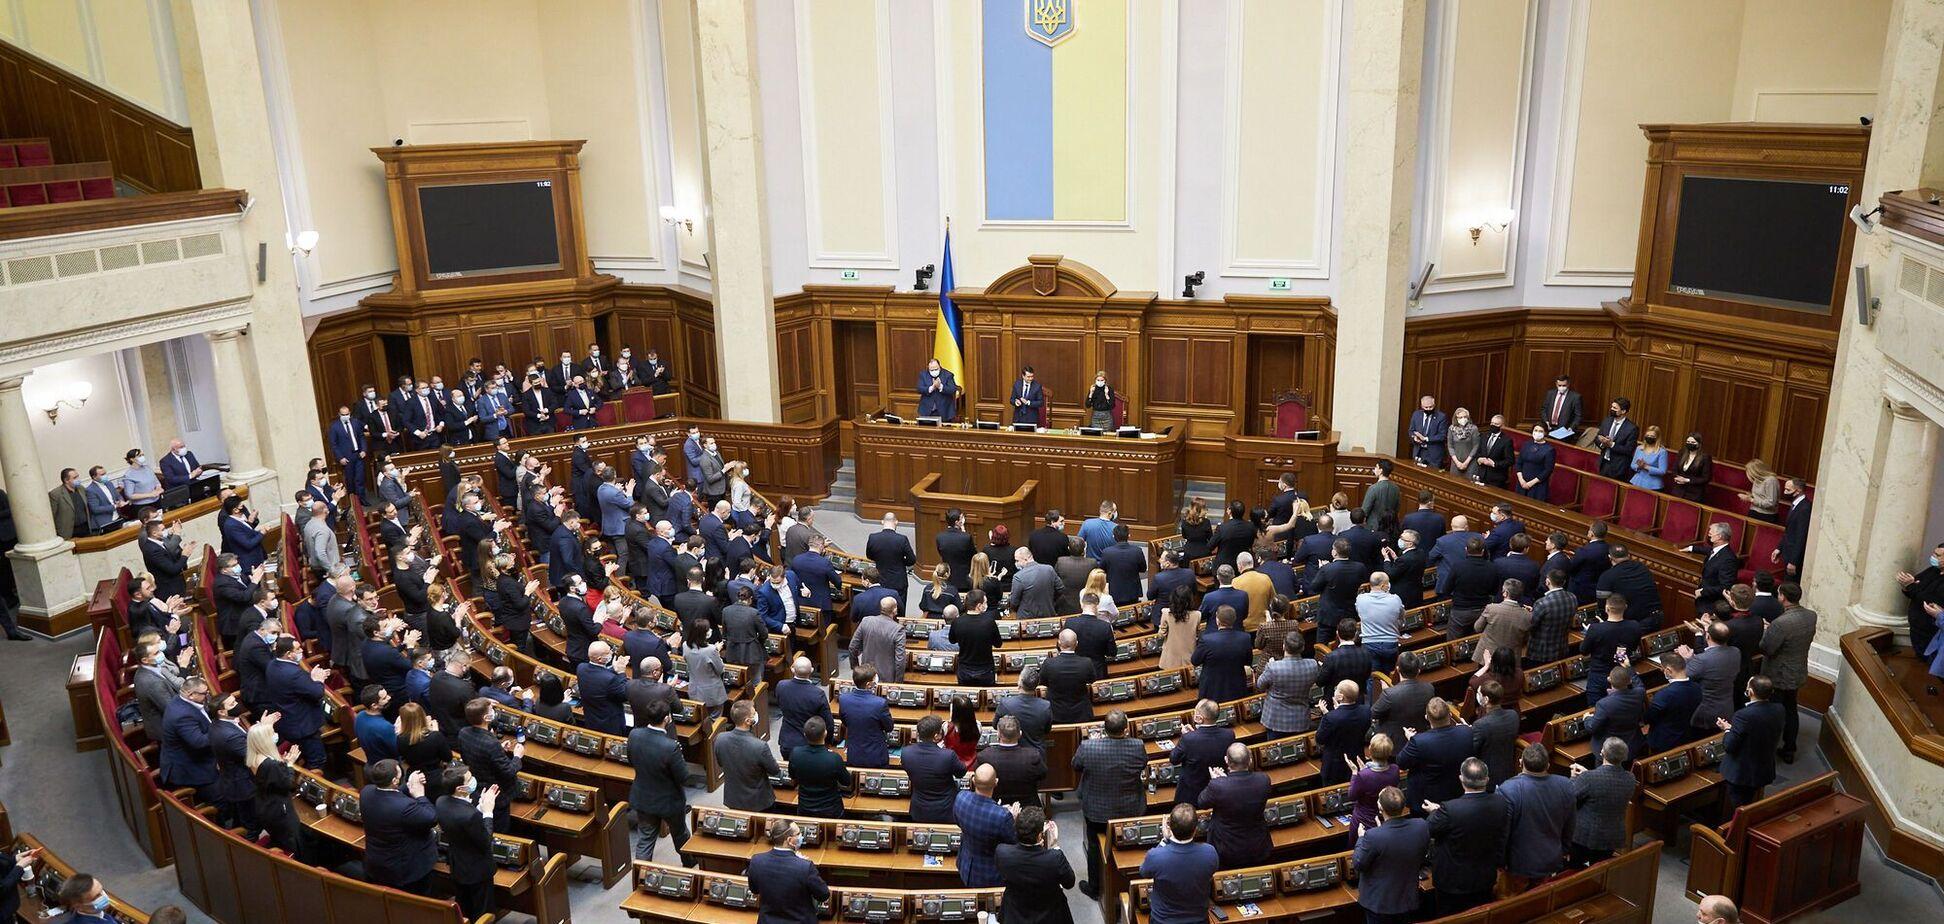 Закон об олигархах несовместим с демократией, – Костенко